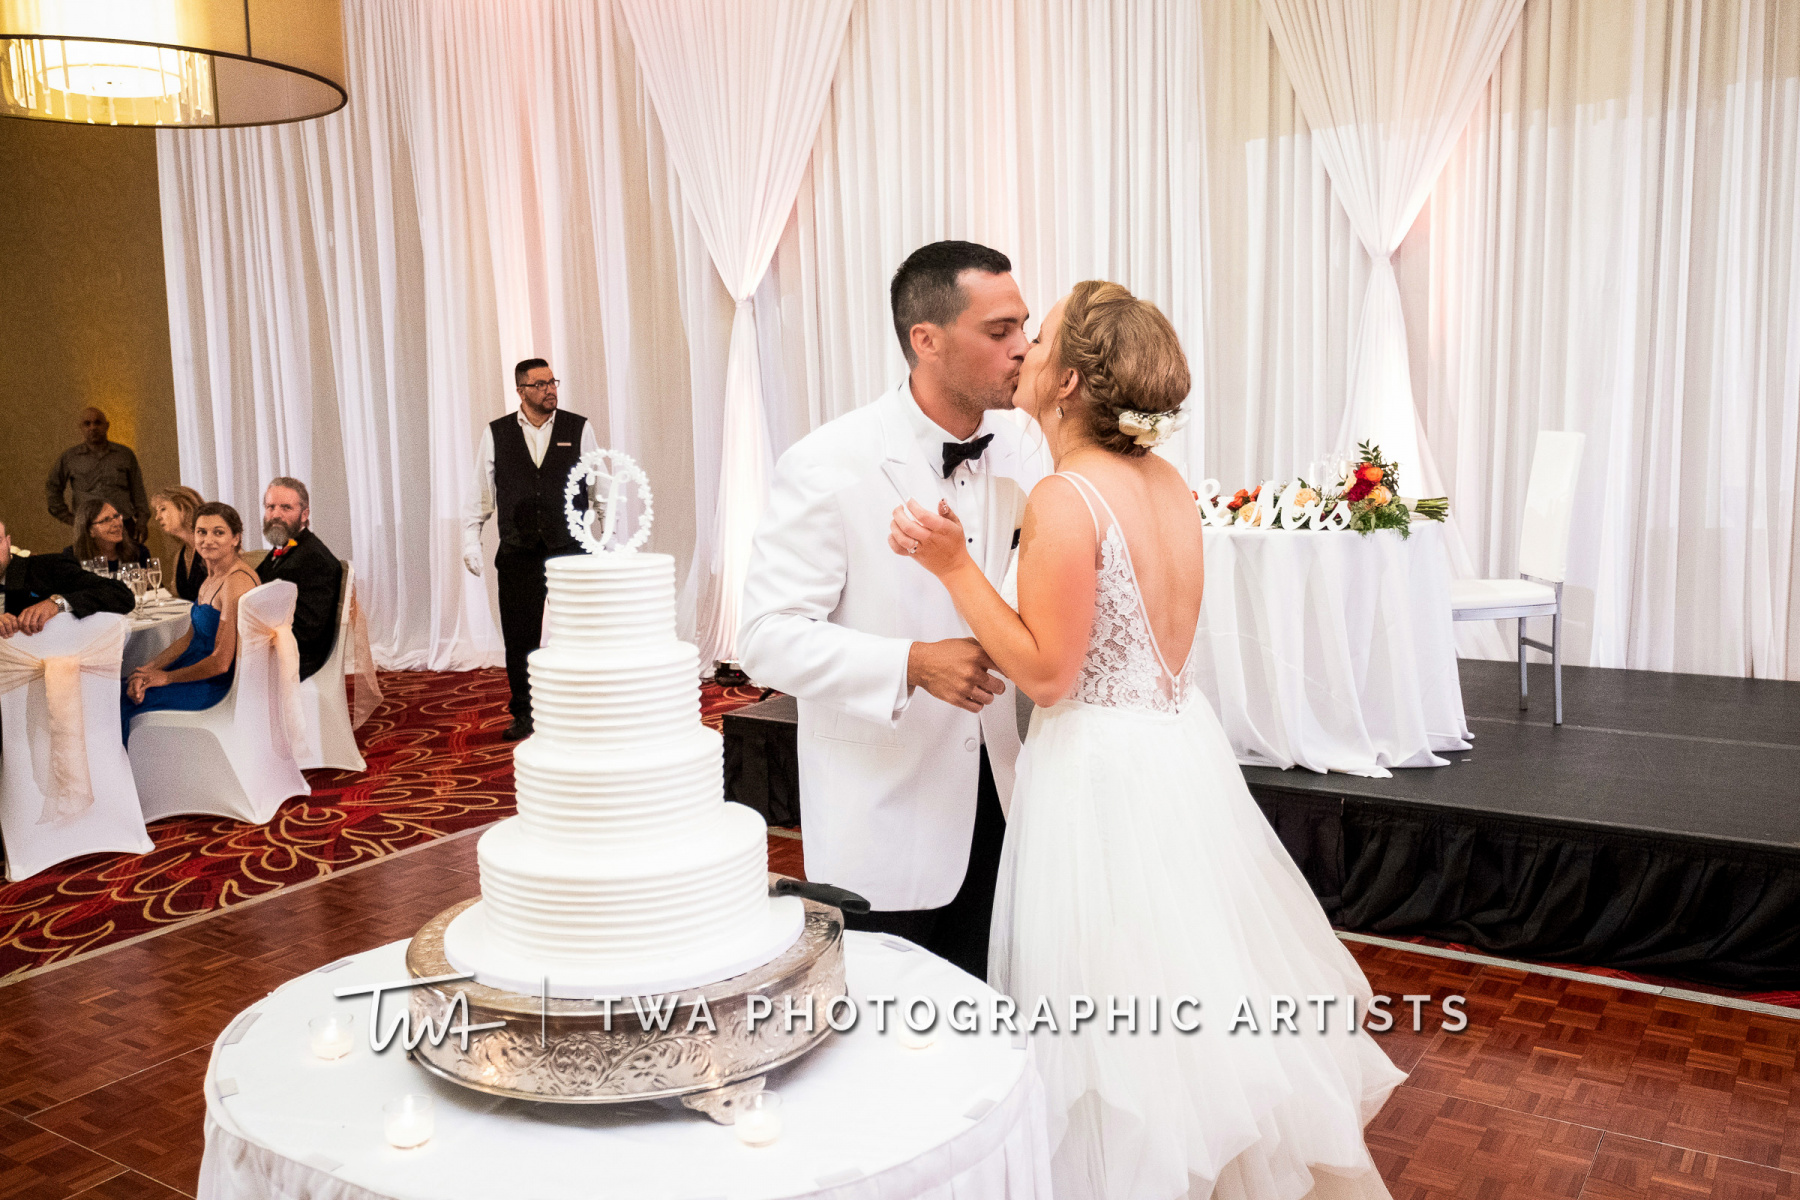 Chicago-Wedding-Photographers-Renaissance-Hotel_Hohensee_Fleishman_JG_DK-075-0499